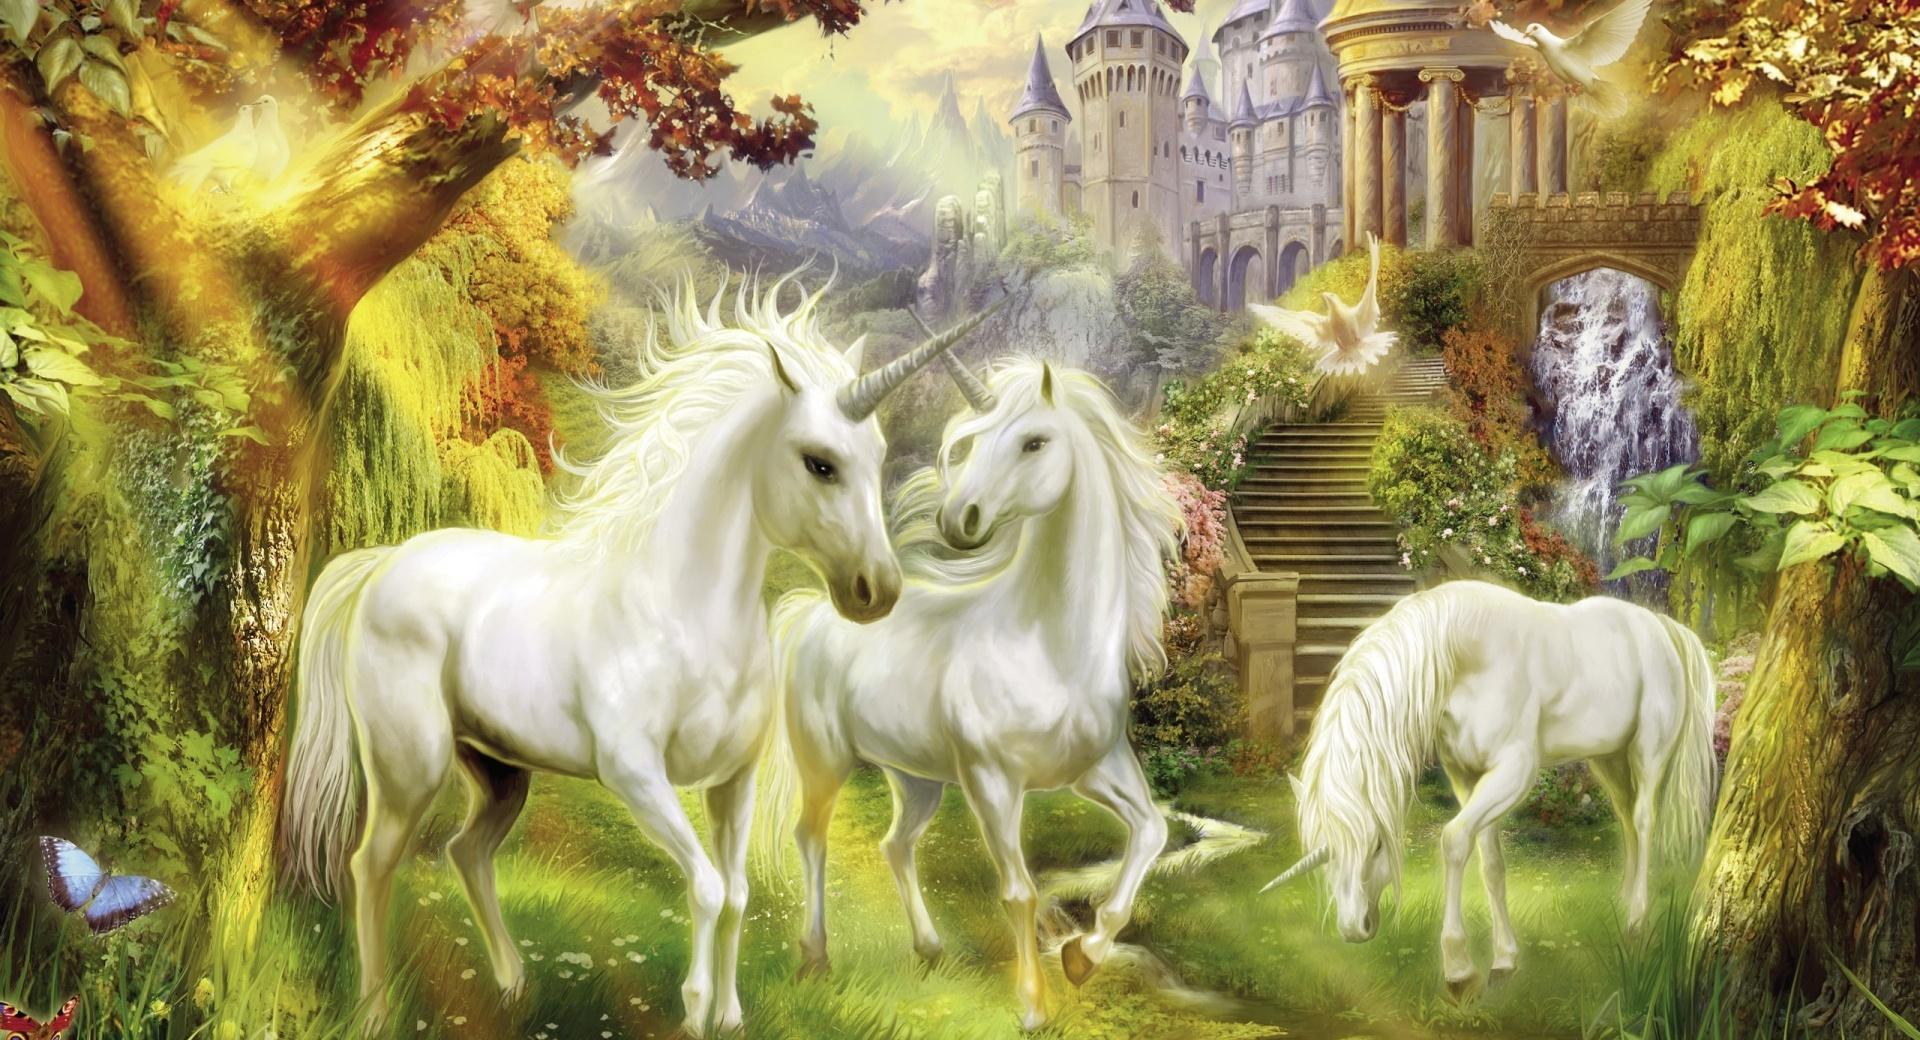 Fantasy Unicorns wallpapers HD quality